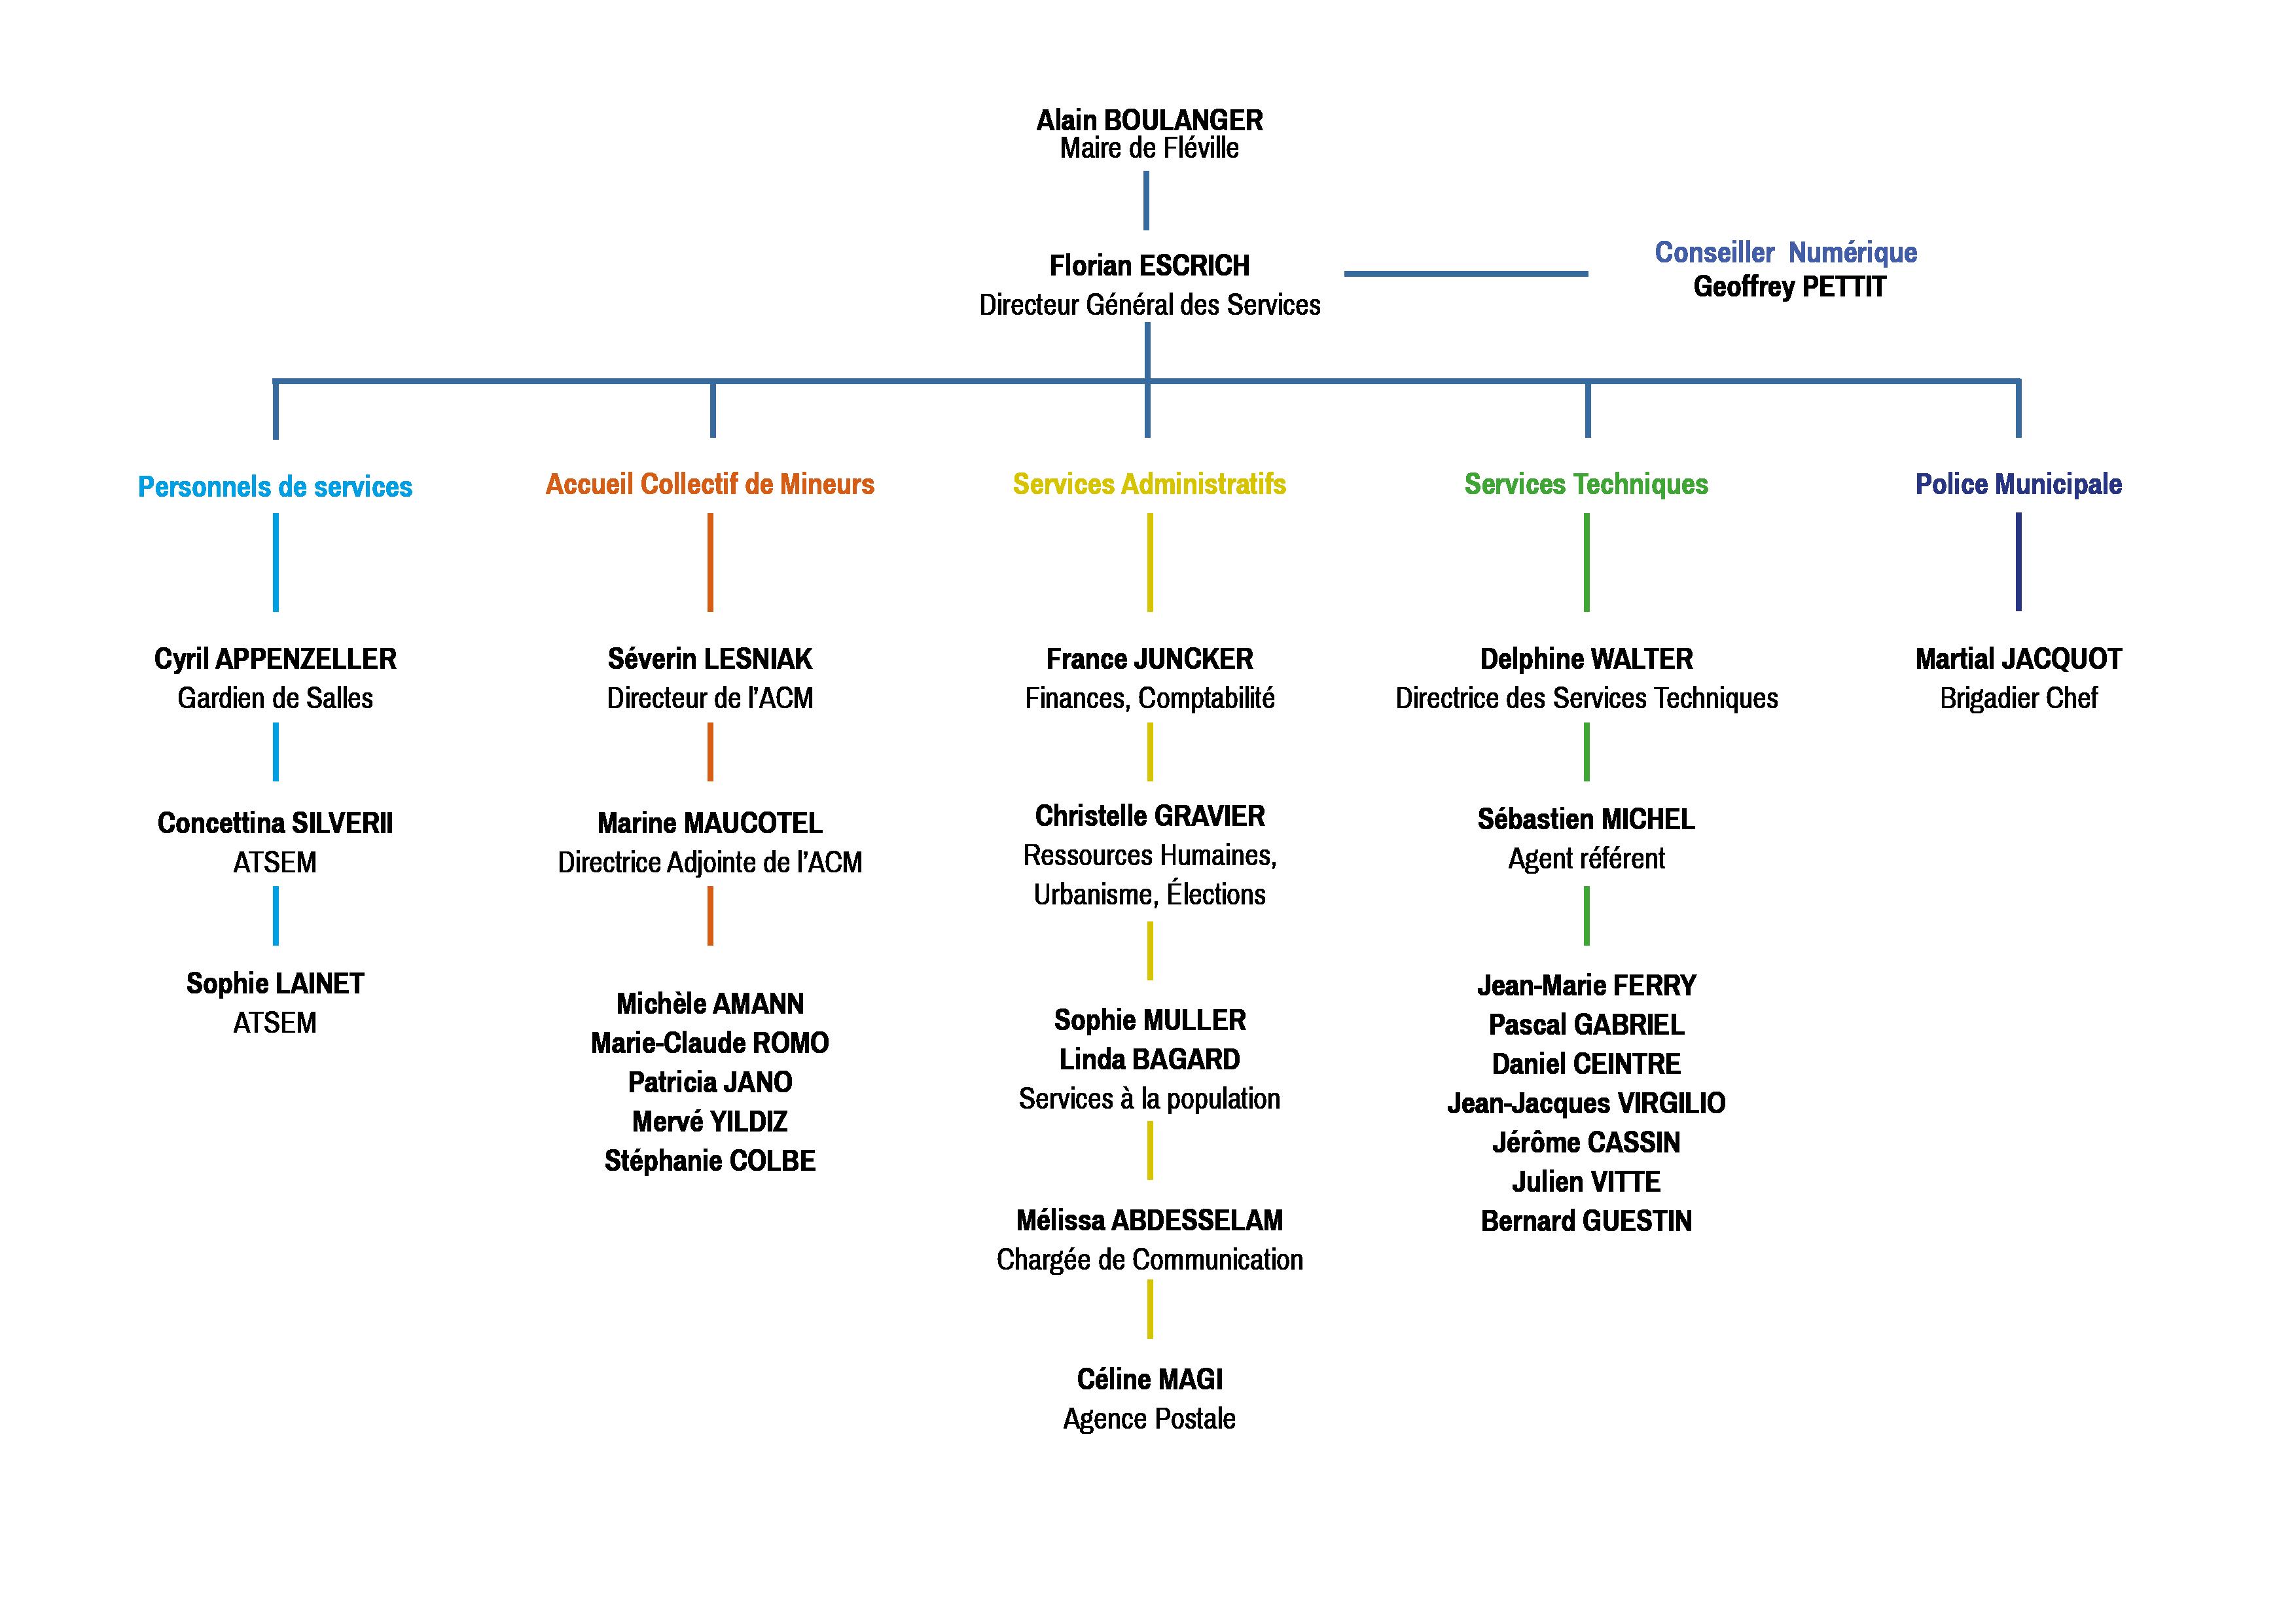 Organigramme des agents municipaux